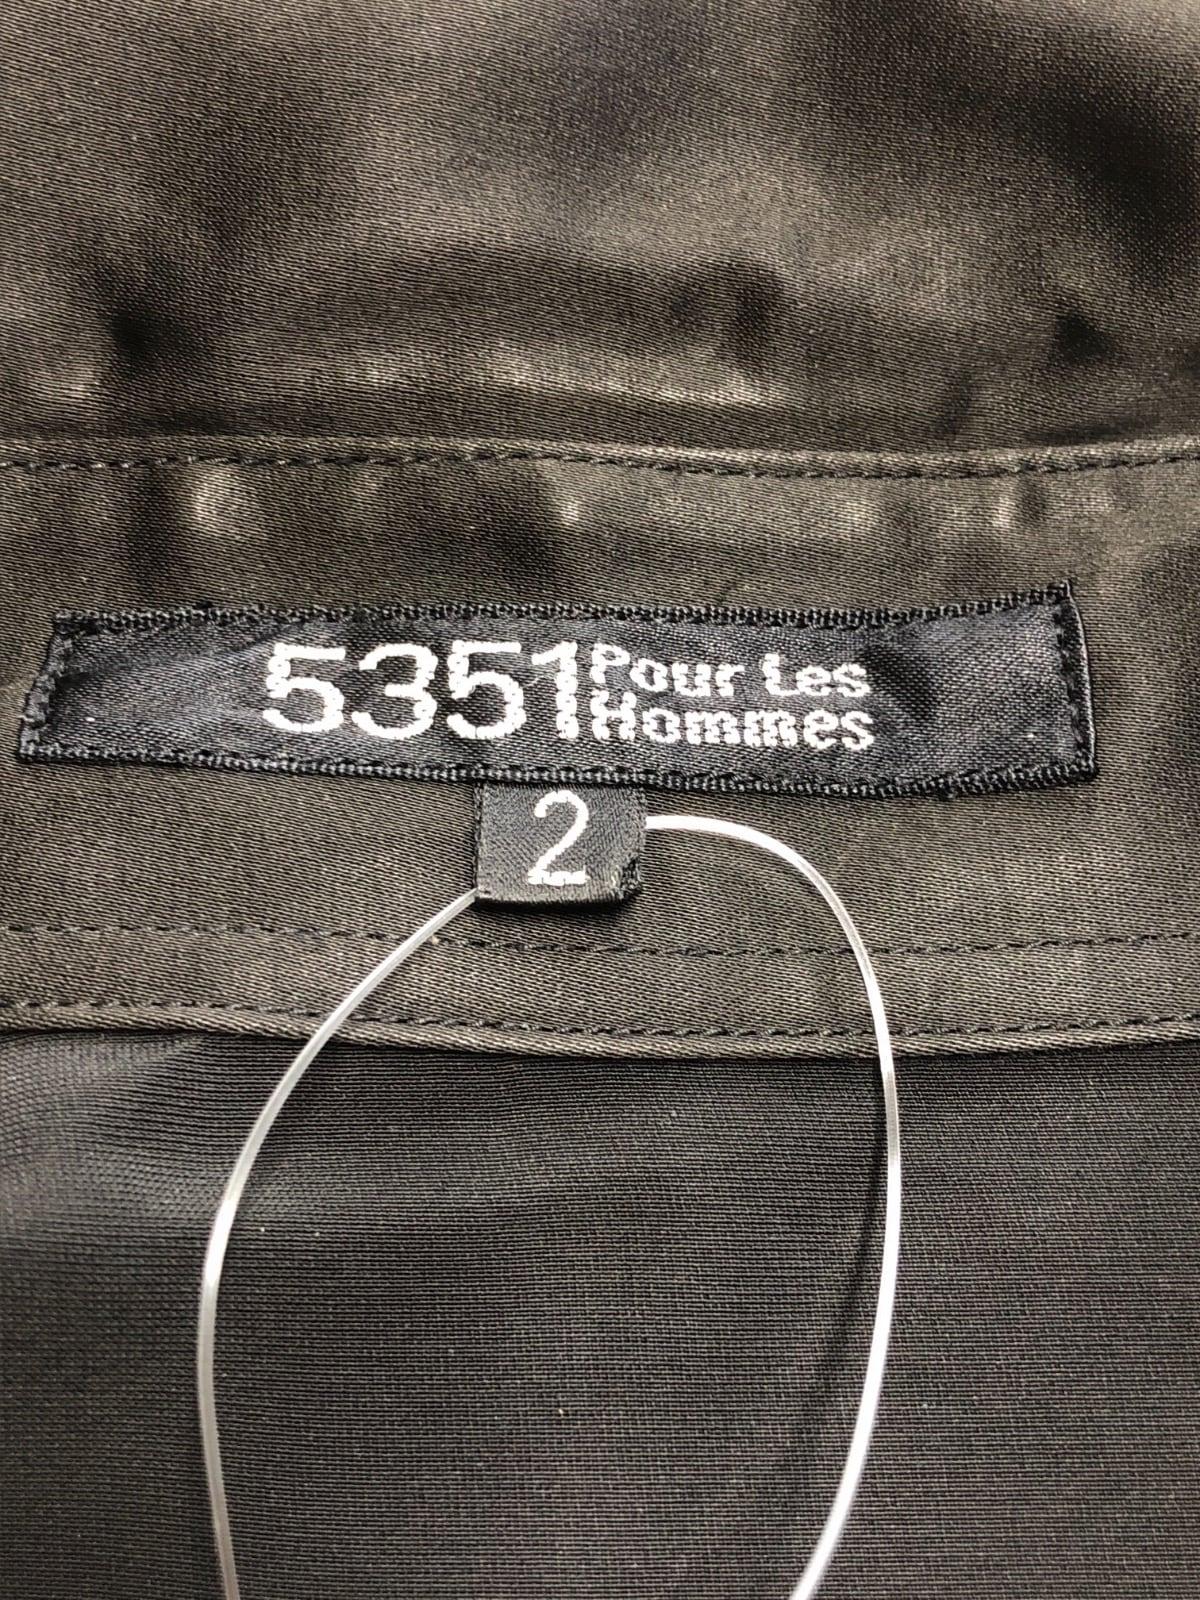 5351 PourLesHomme(5351プールオム)のカットソー